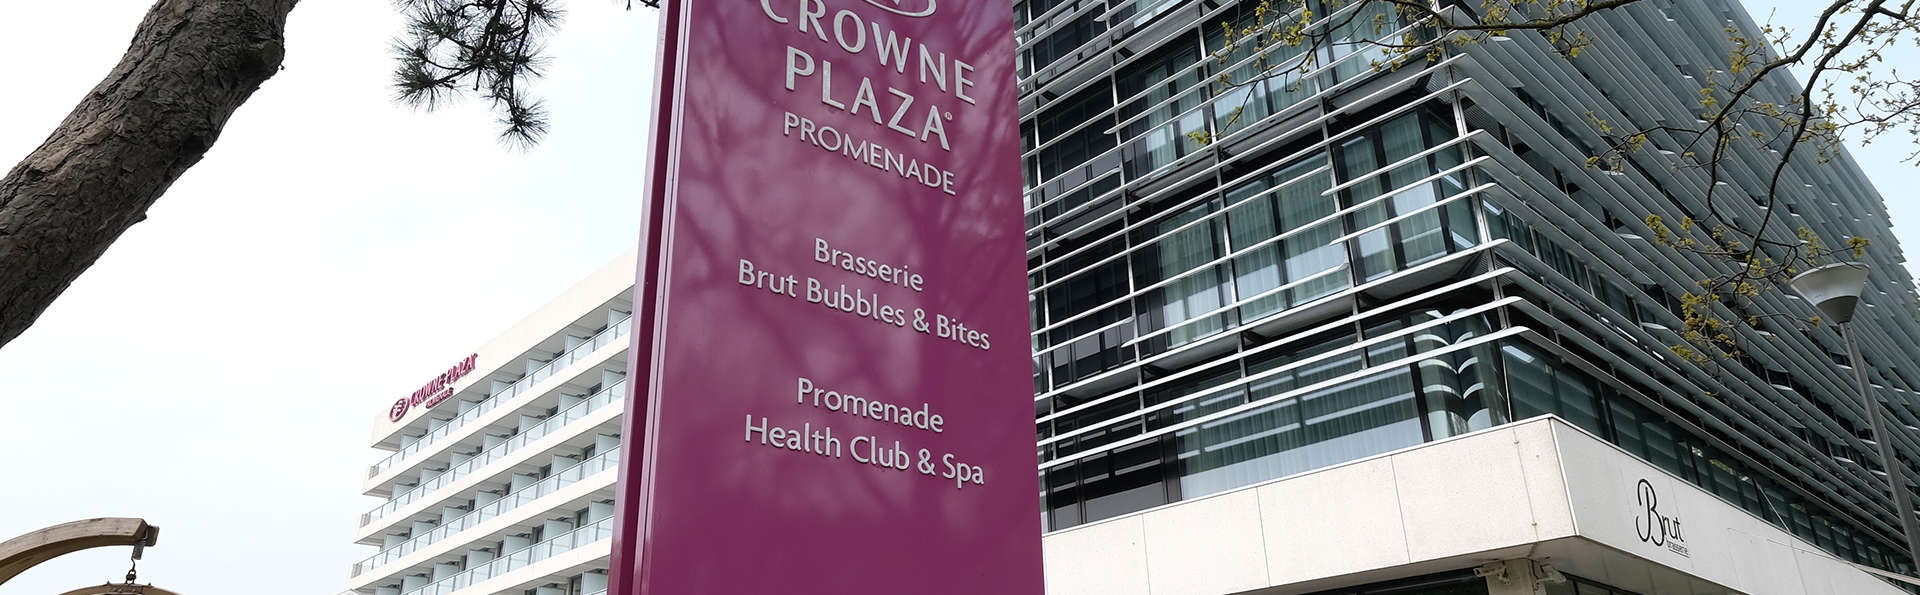 Crowne Plaza Den Haag - Promenade Hotel - EDIT_NEW_front.jpg